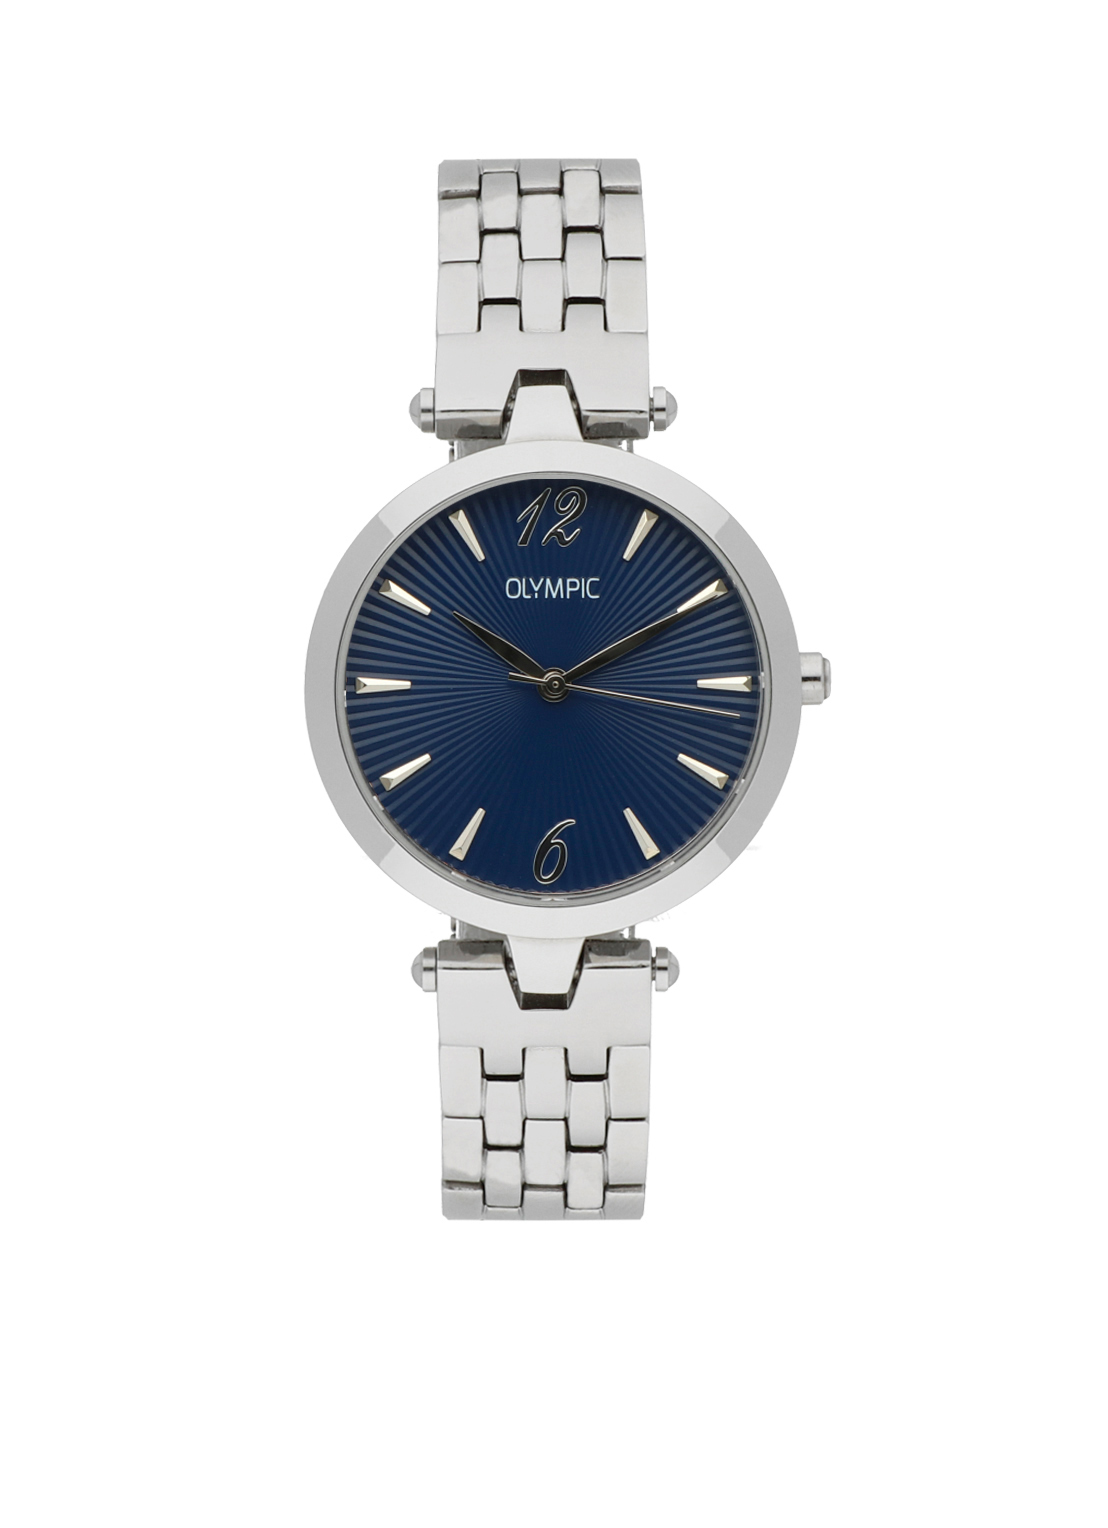 Olympic OL88DSS008 Sorrento Horloge Staal Zilverkleurig 32mm Dames